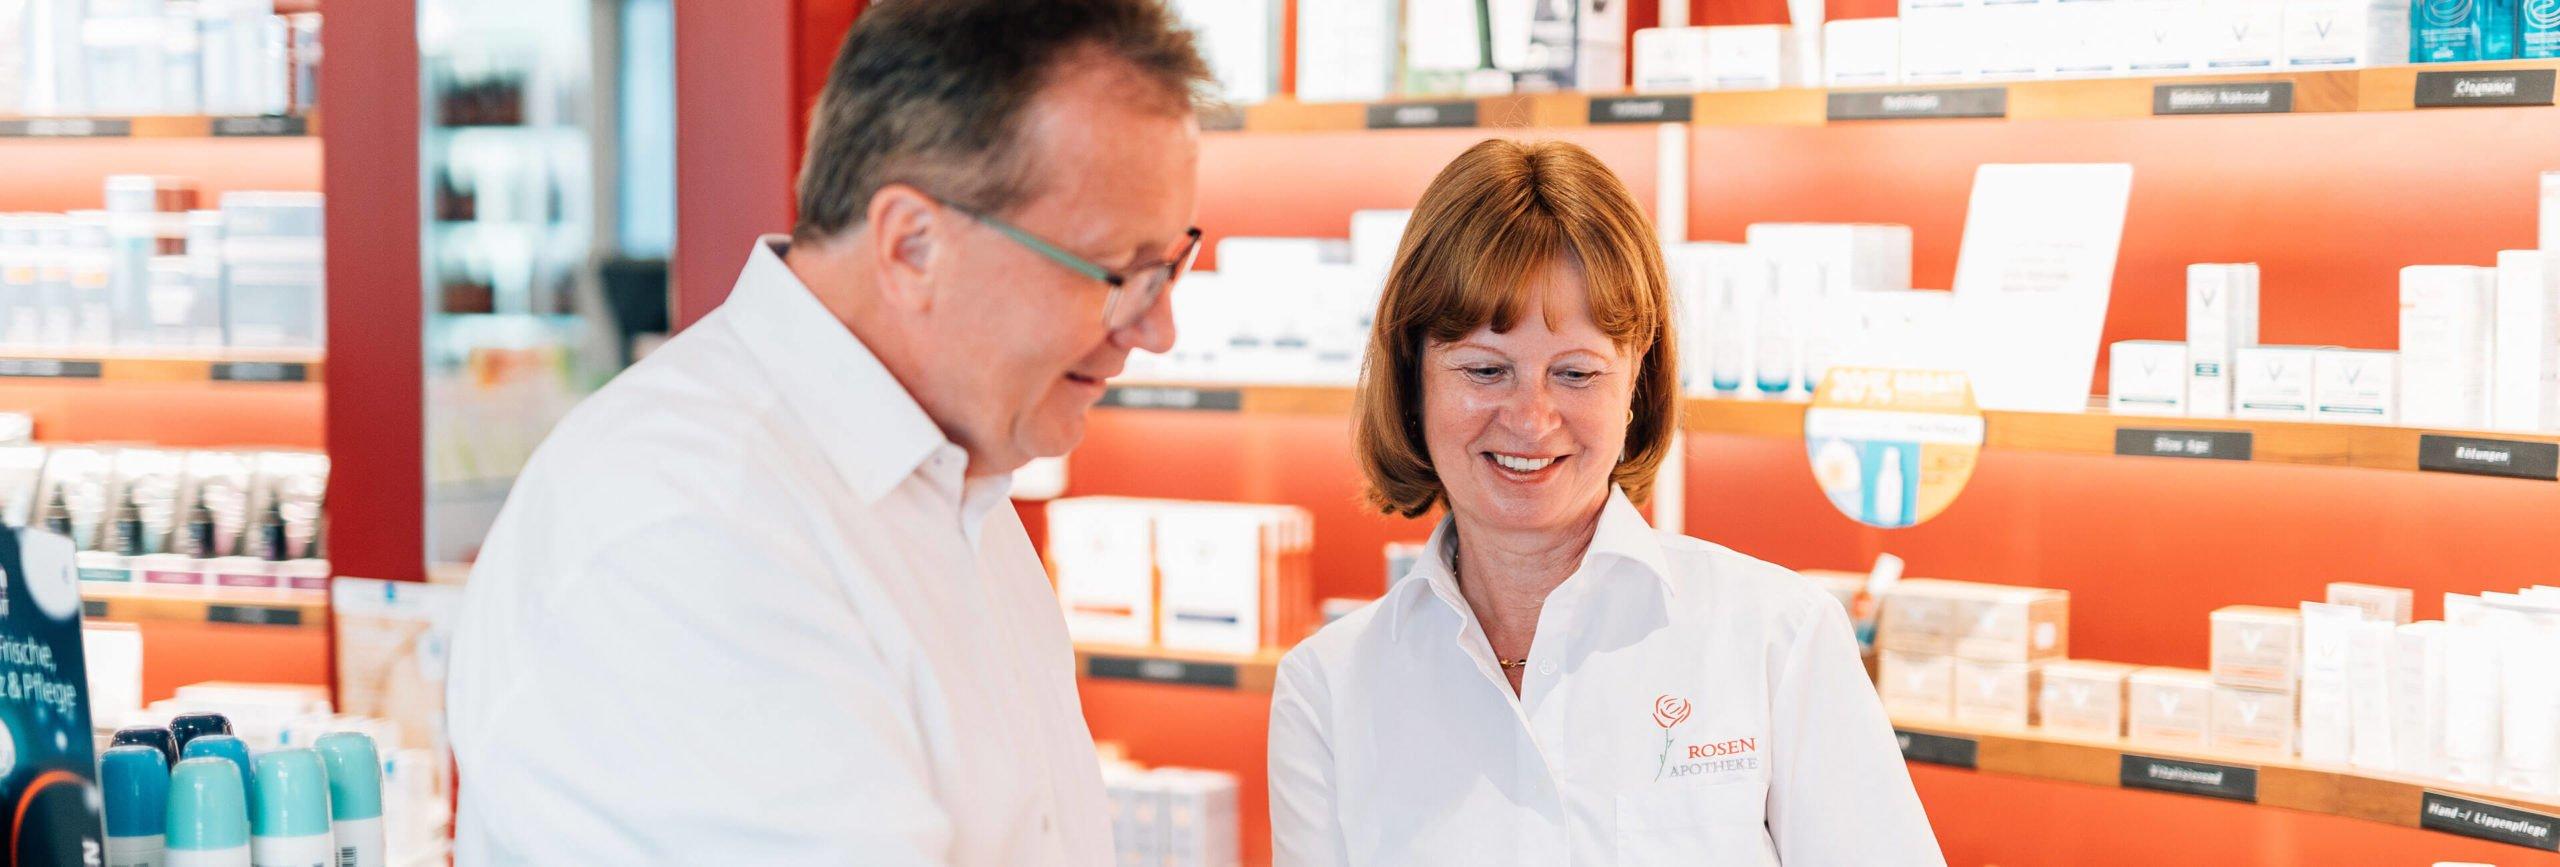 rosen-apotheke-guetersloh-kontakt-beratung-service